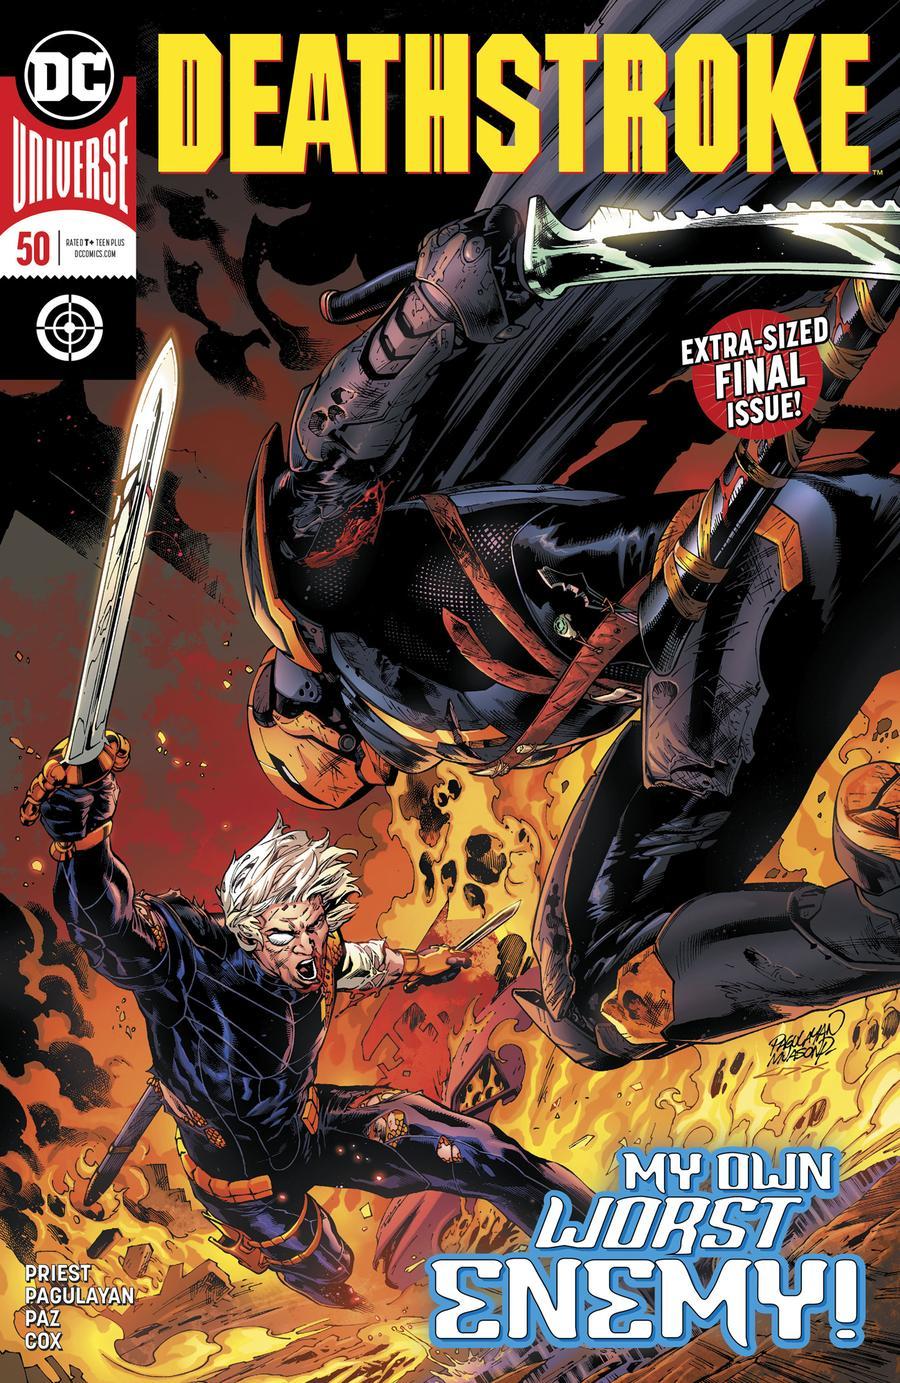 Deathstroke Vol 4 #50 Cover A Regular Carlo Pagulayan & Jason Paz Cover